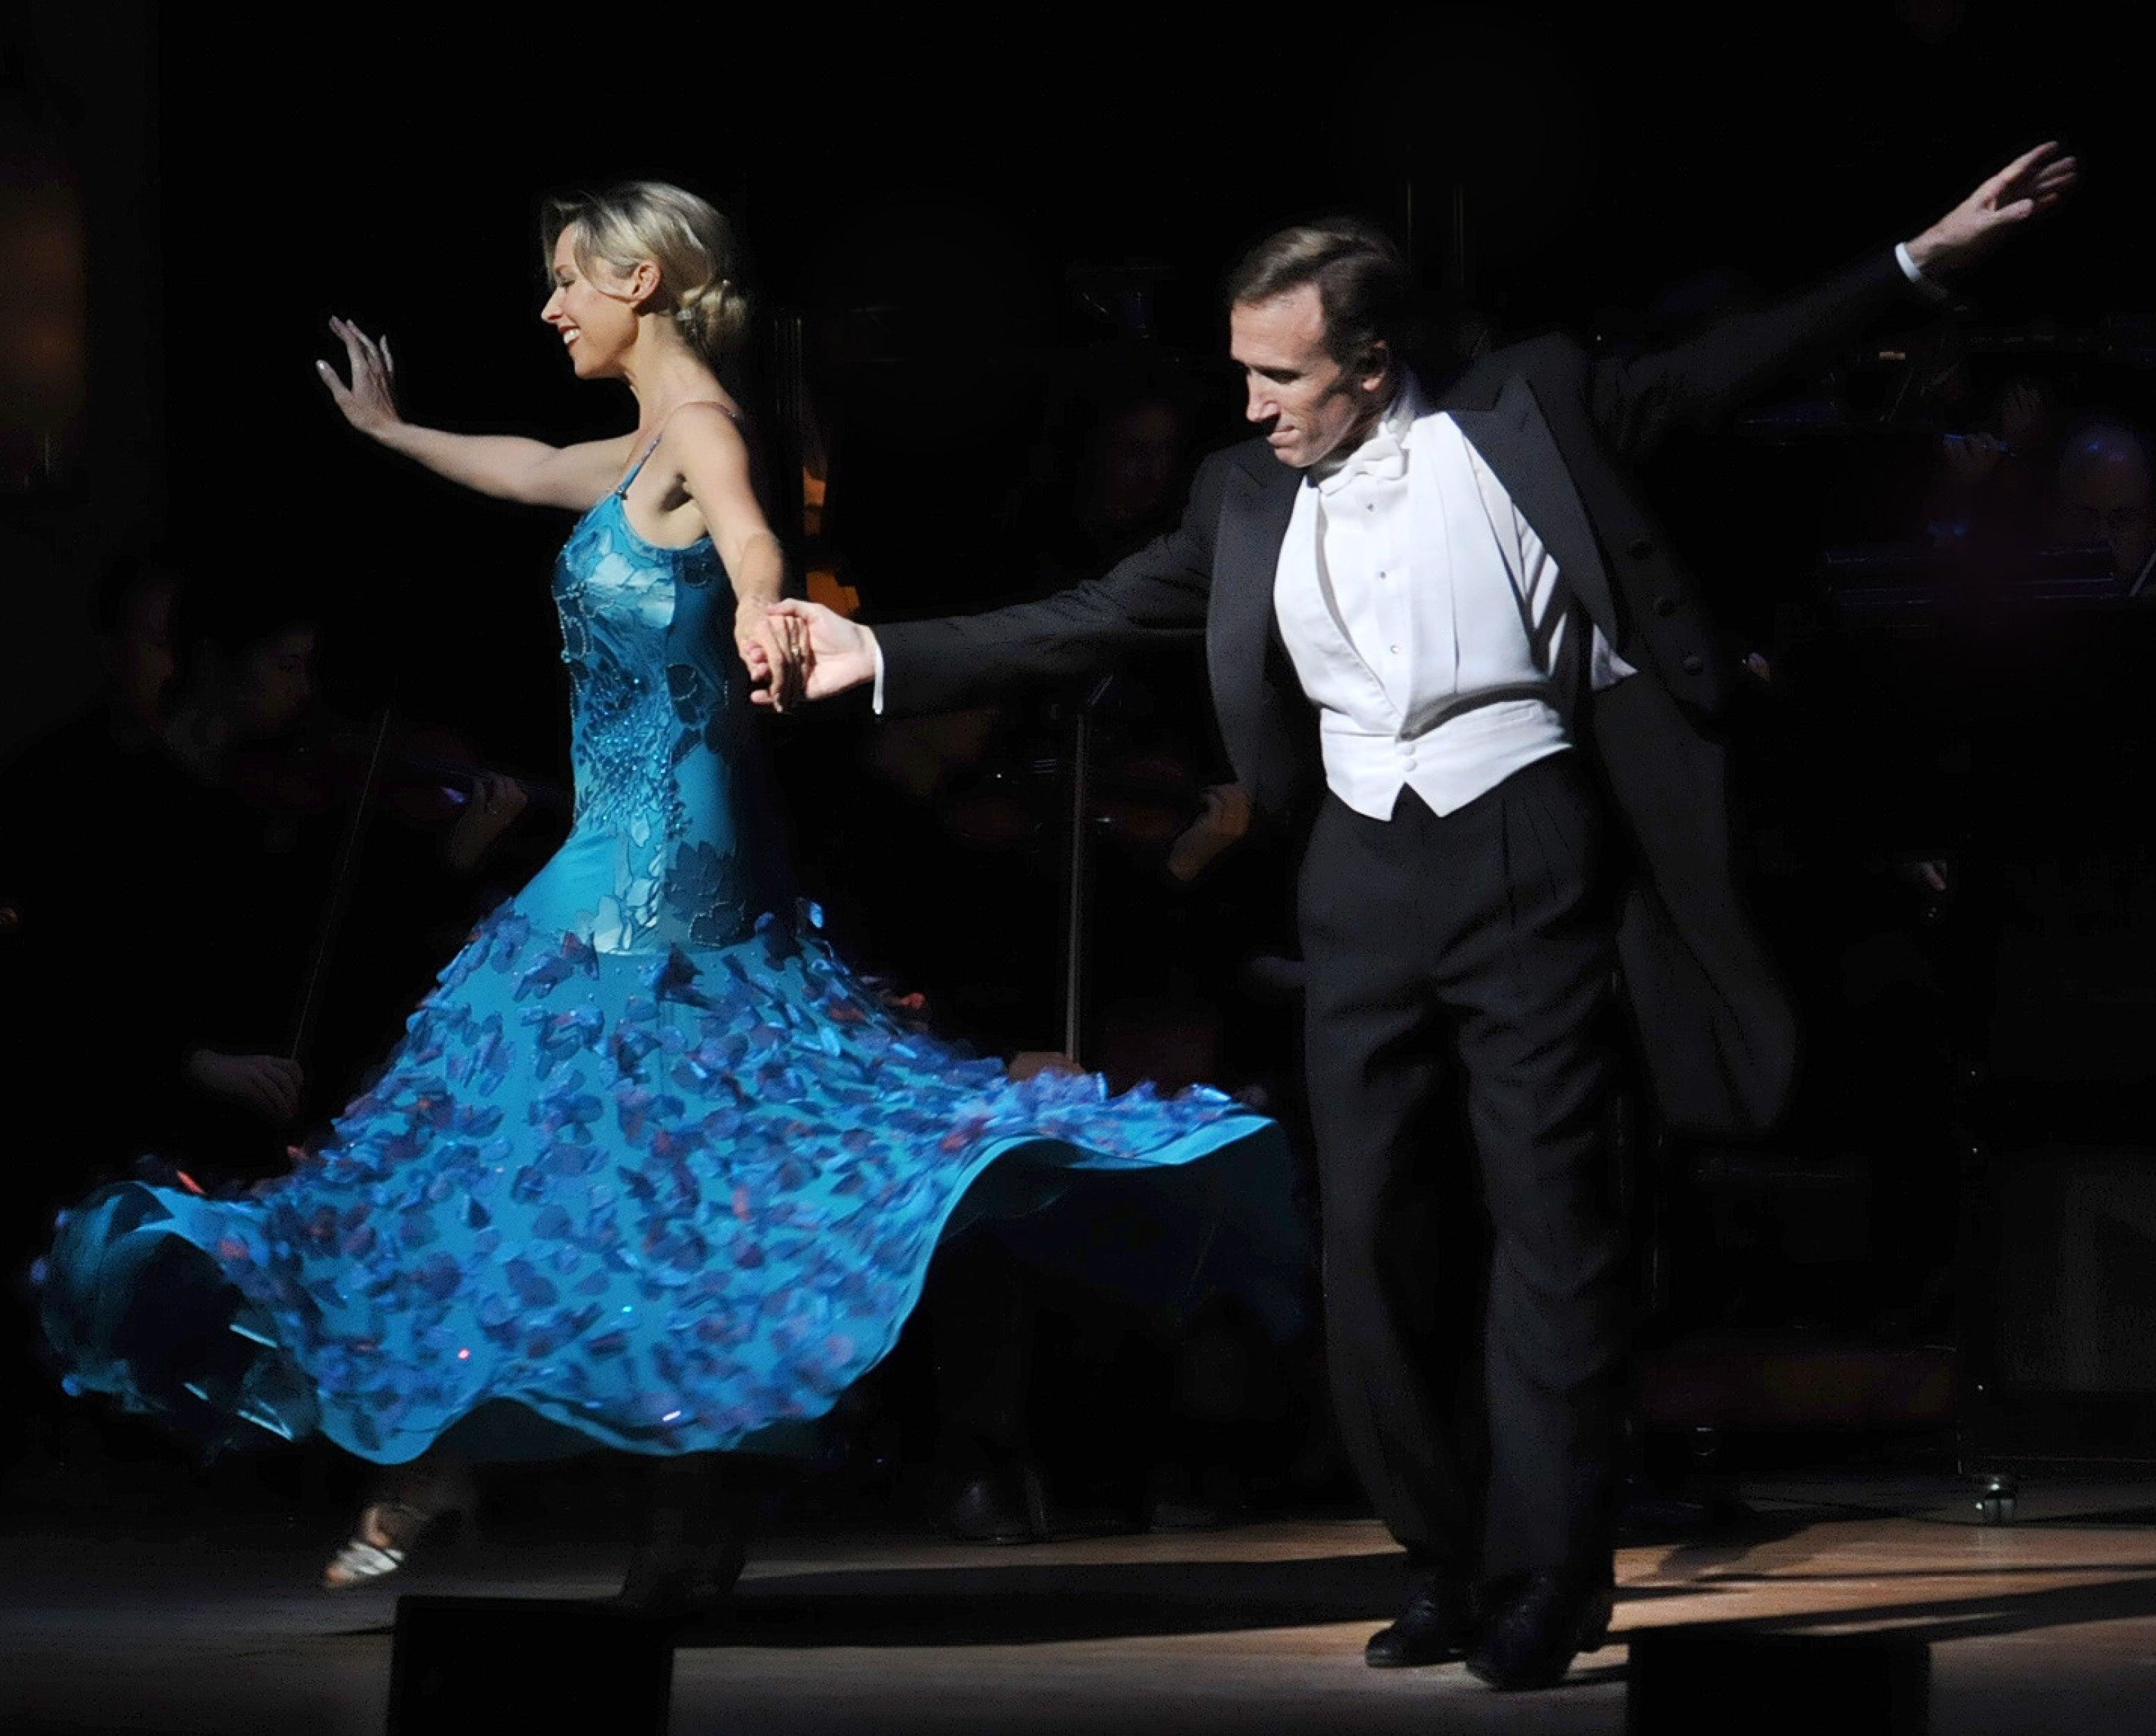 MOSC Pops Dancing & Romancing